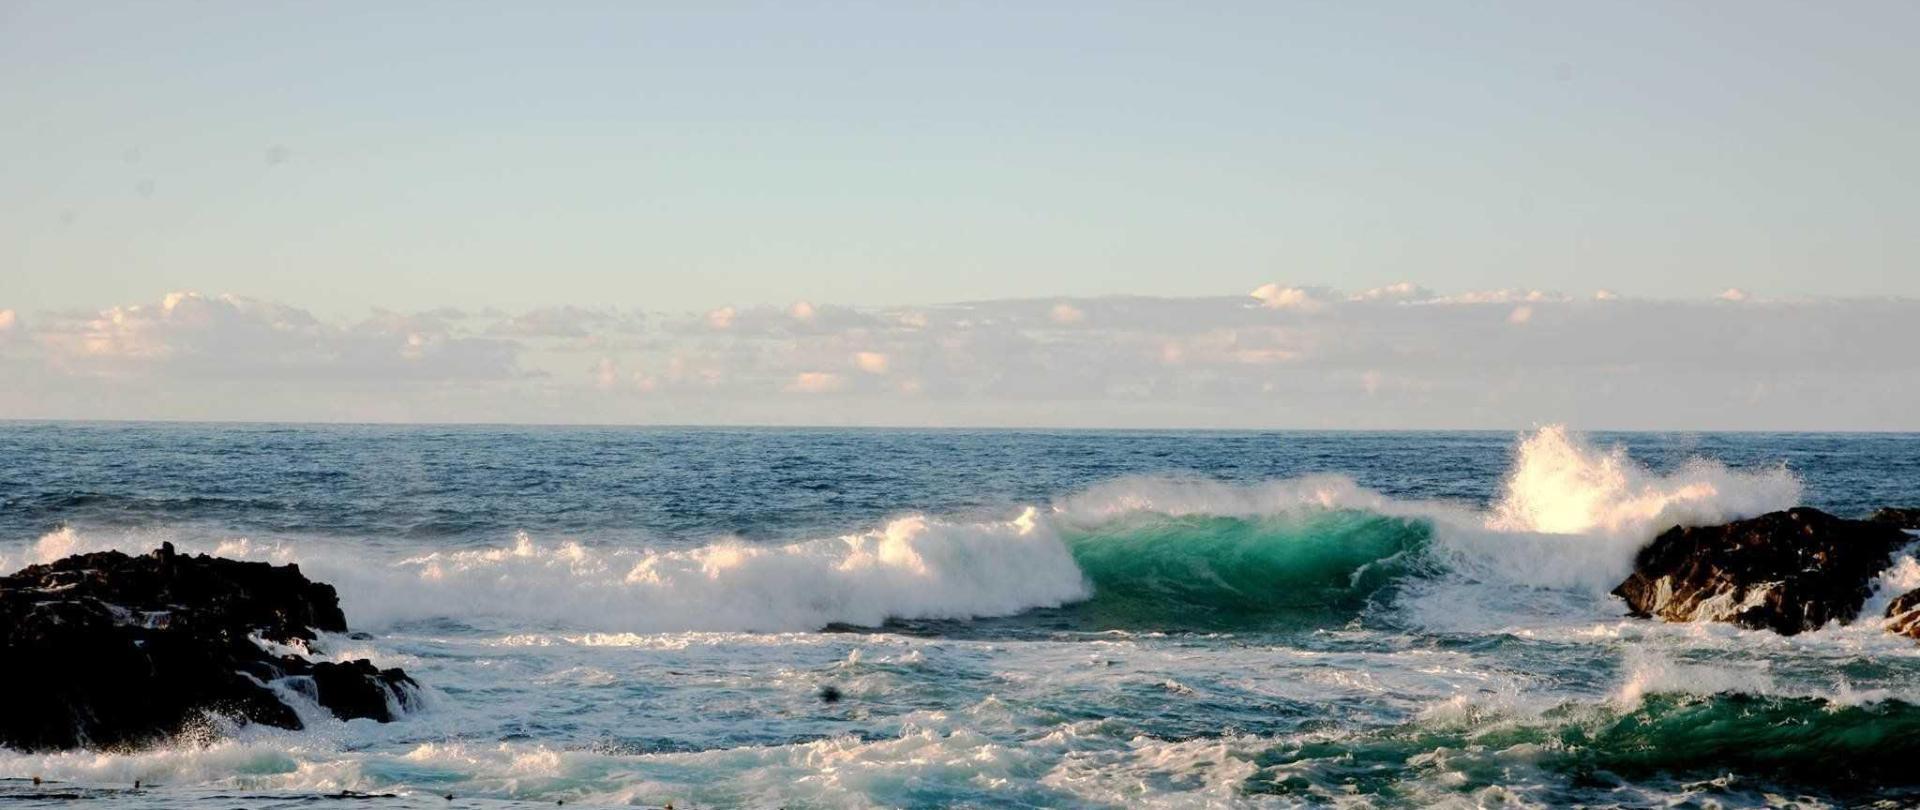 mesa-del-mar-tacoronte.jpg